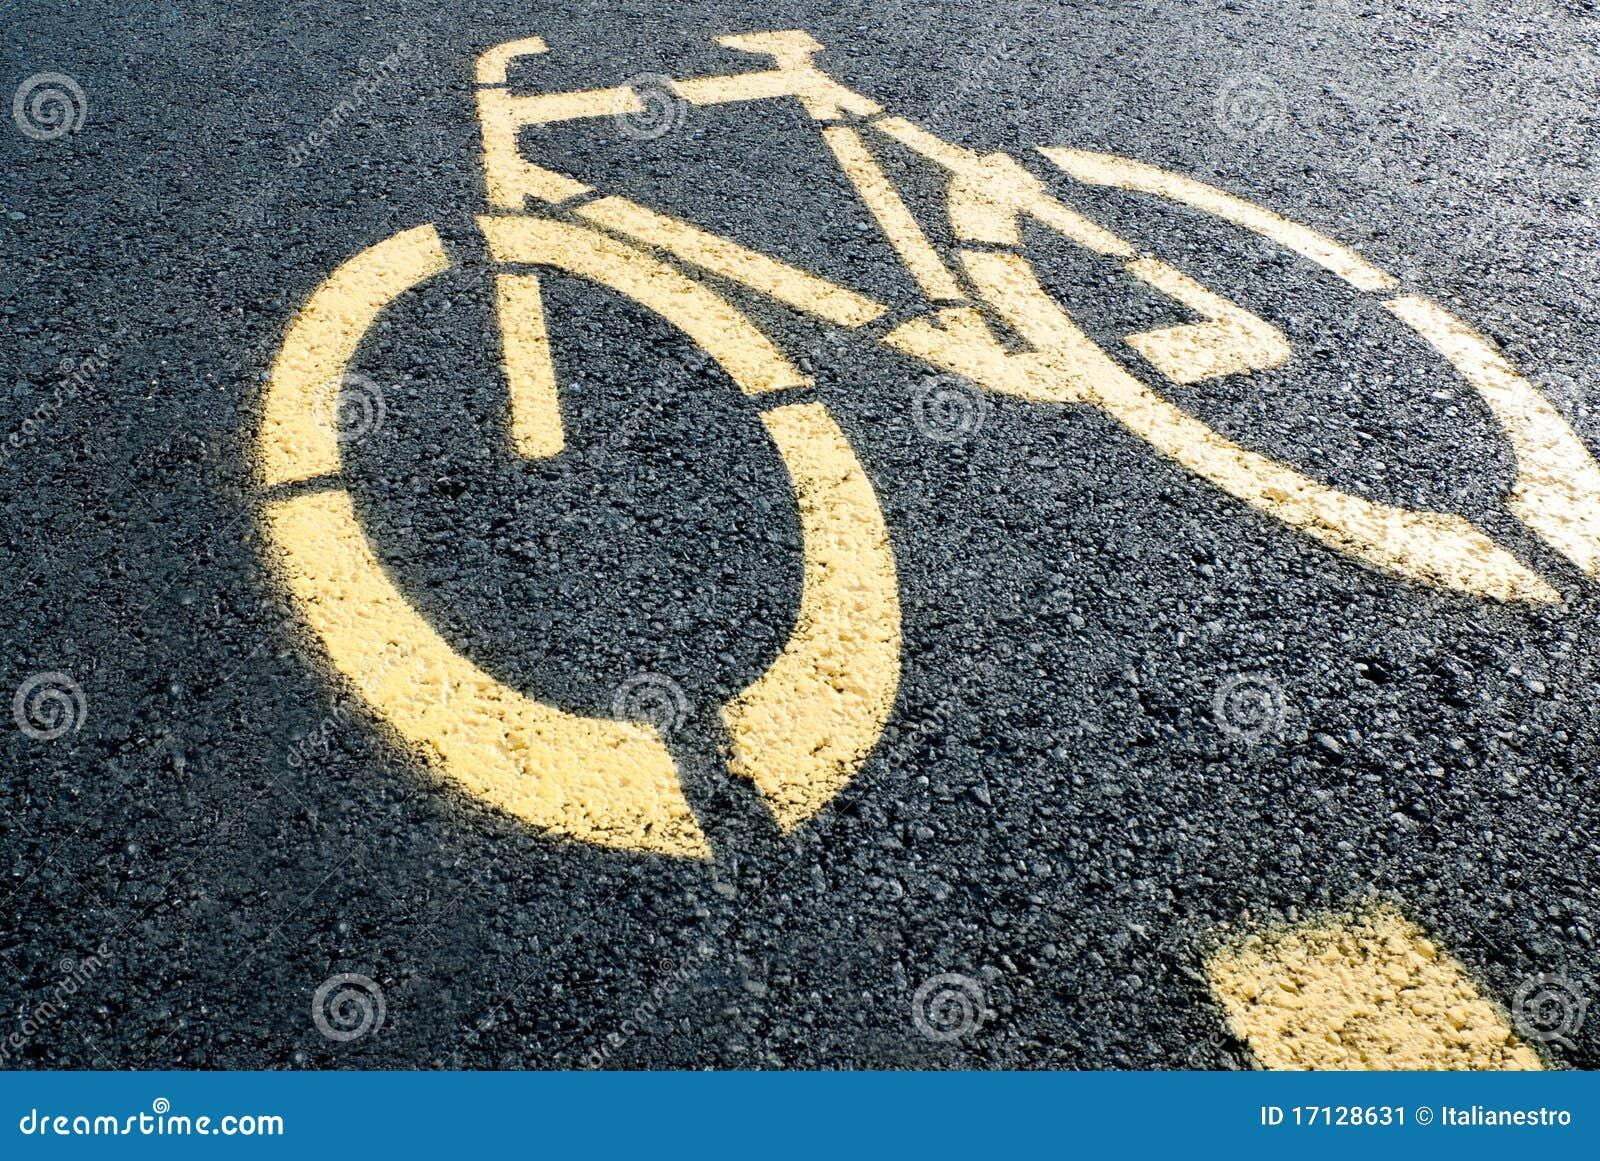 Sinal da pista de bicicleta na estrada